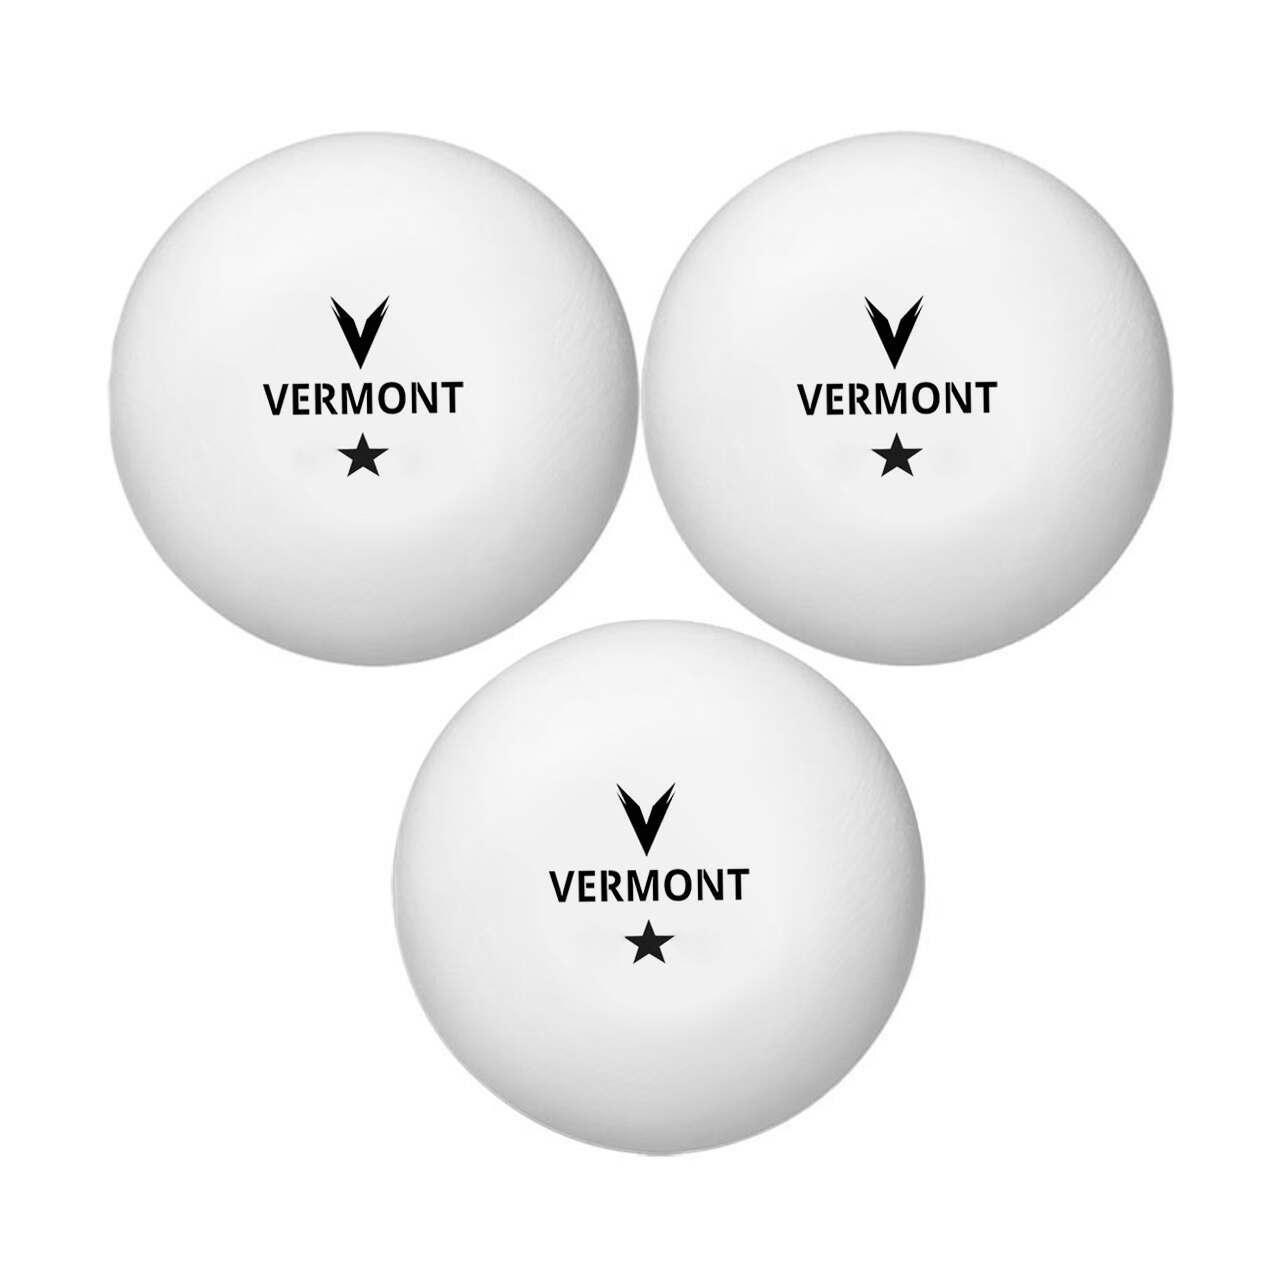 Vermont 1-Star Ping Pong Balls (90 Ball Bucket)